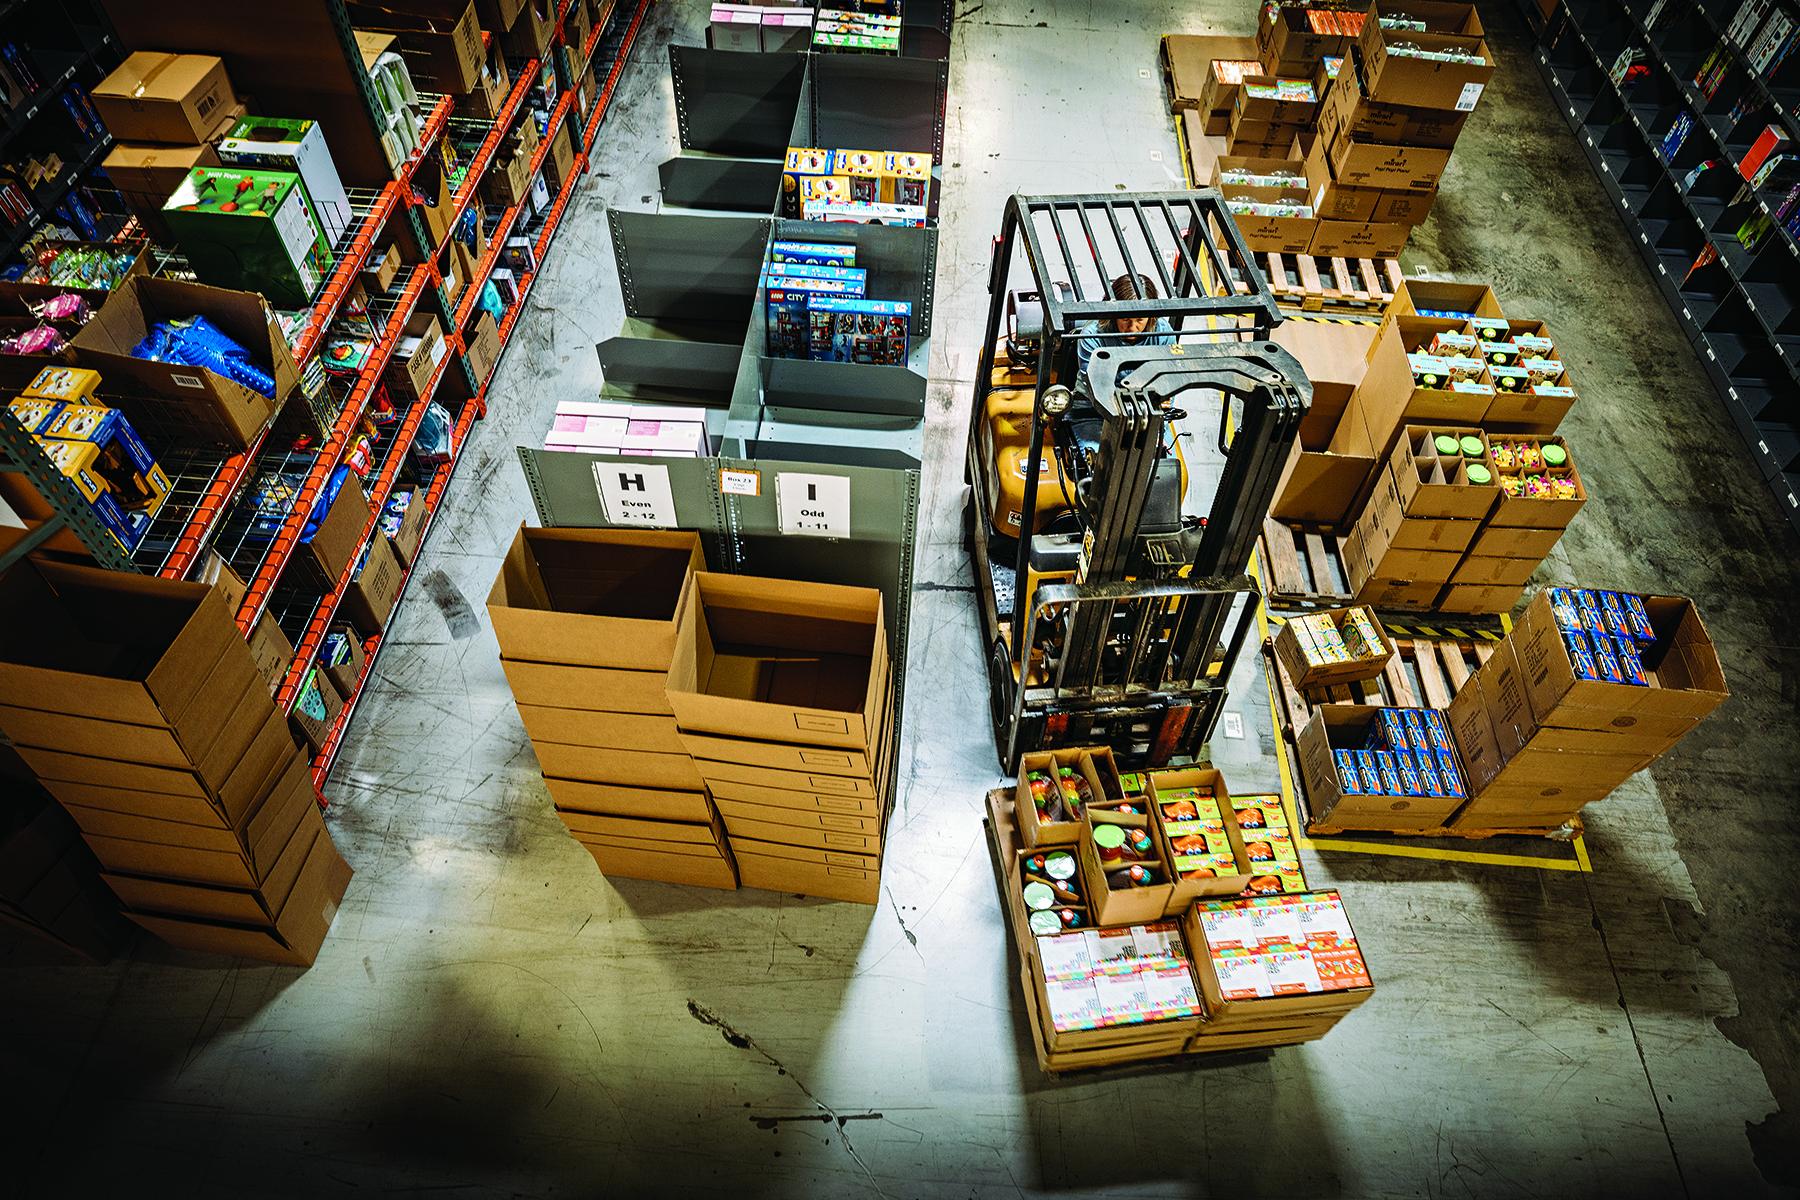 Perc propane forklift warehouse